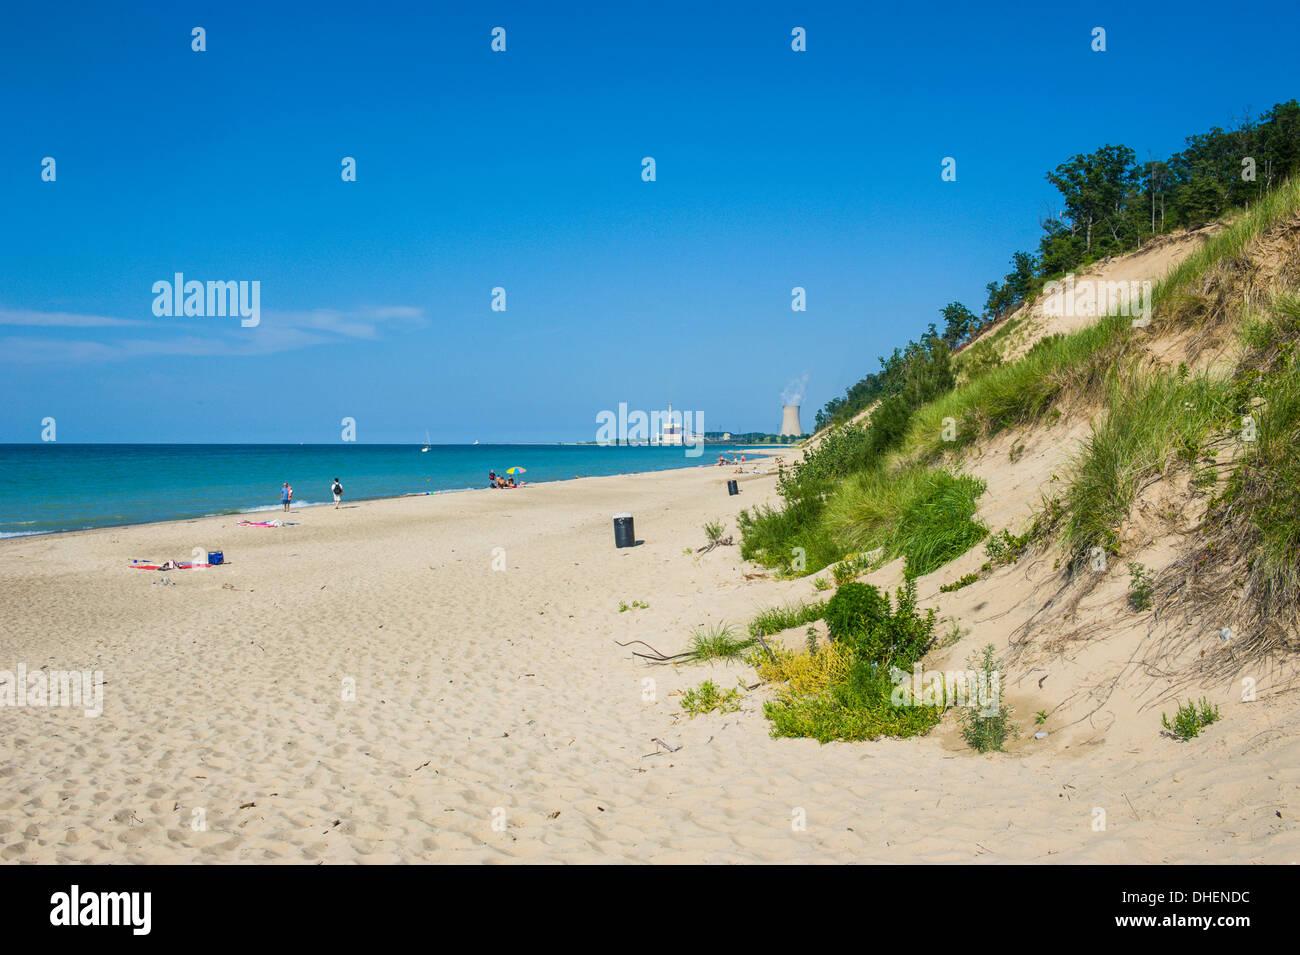 Indiana sand dunes, Indiana, United States of America, North America - Stock Image